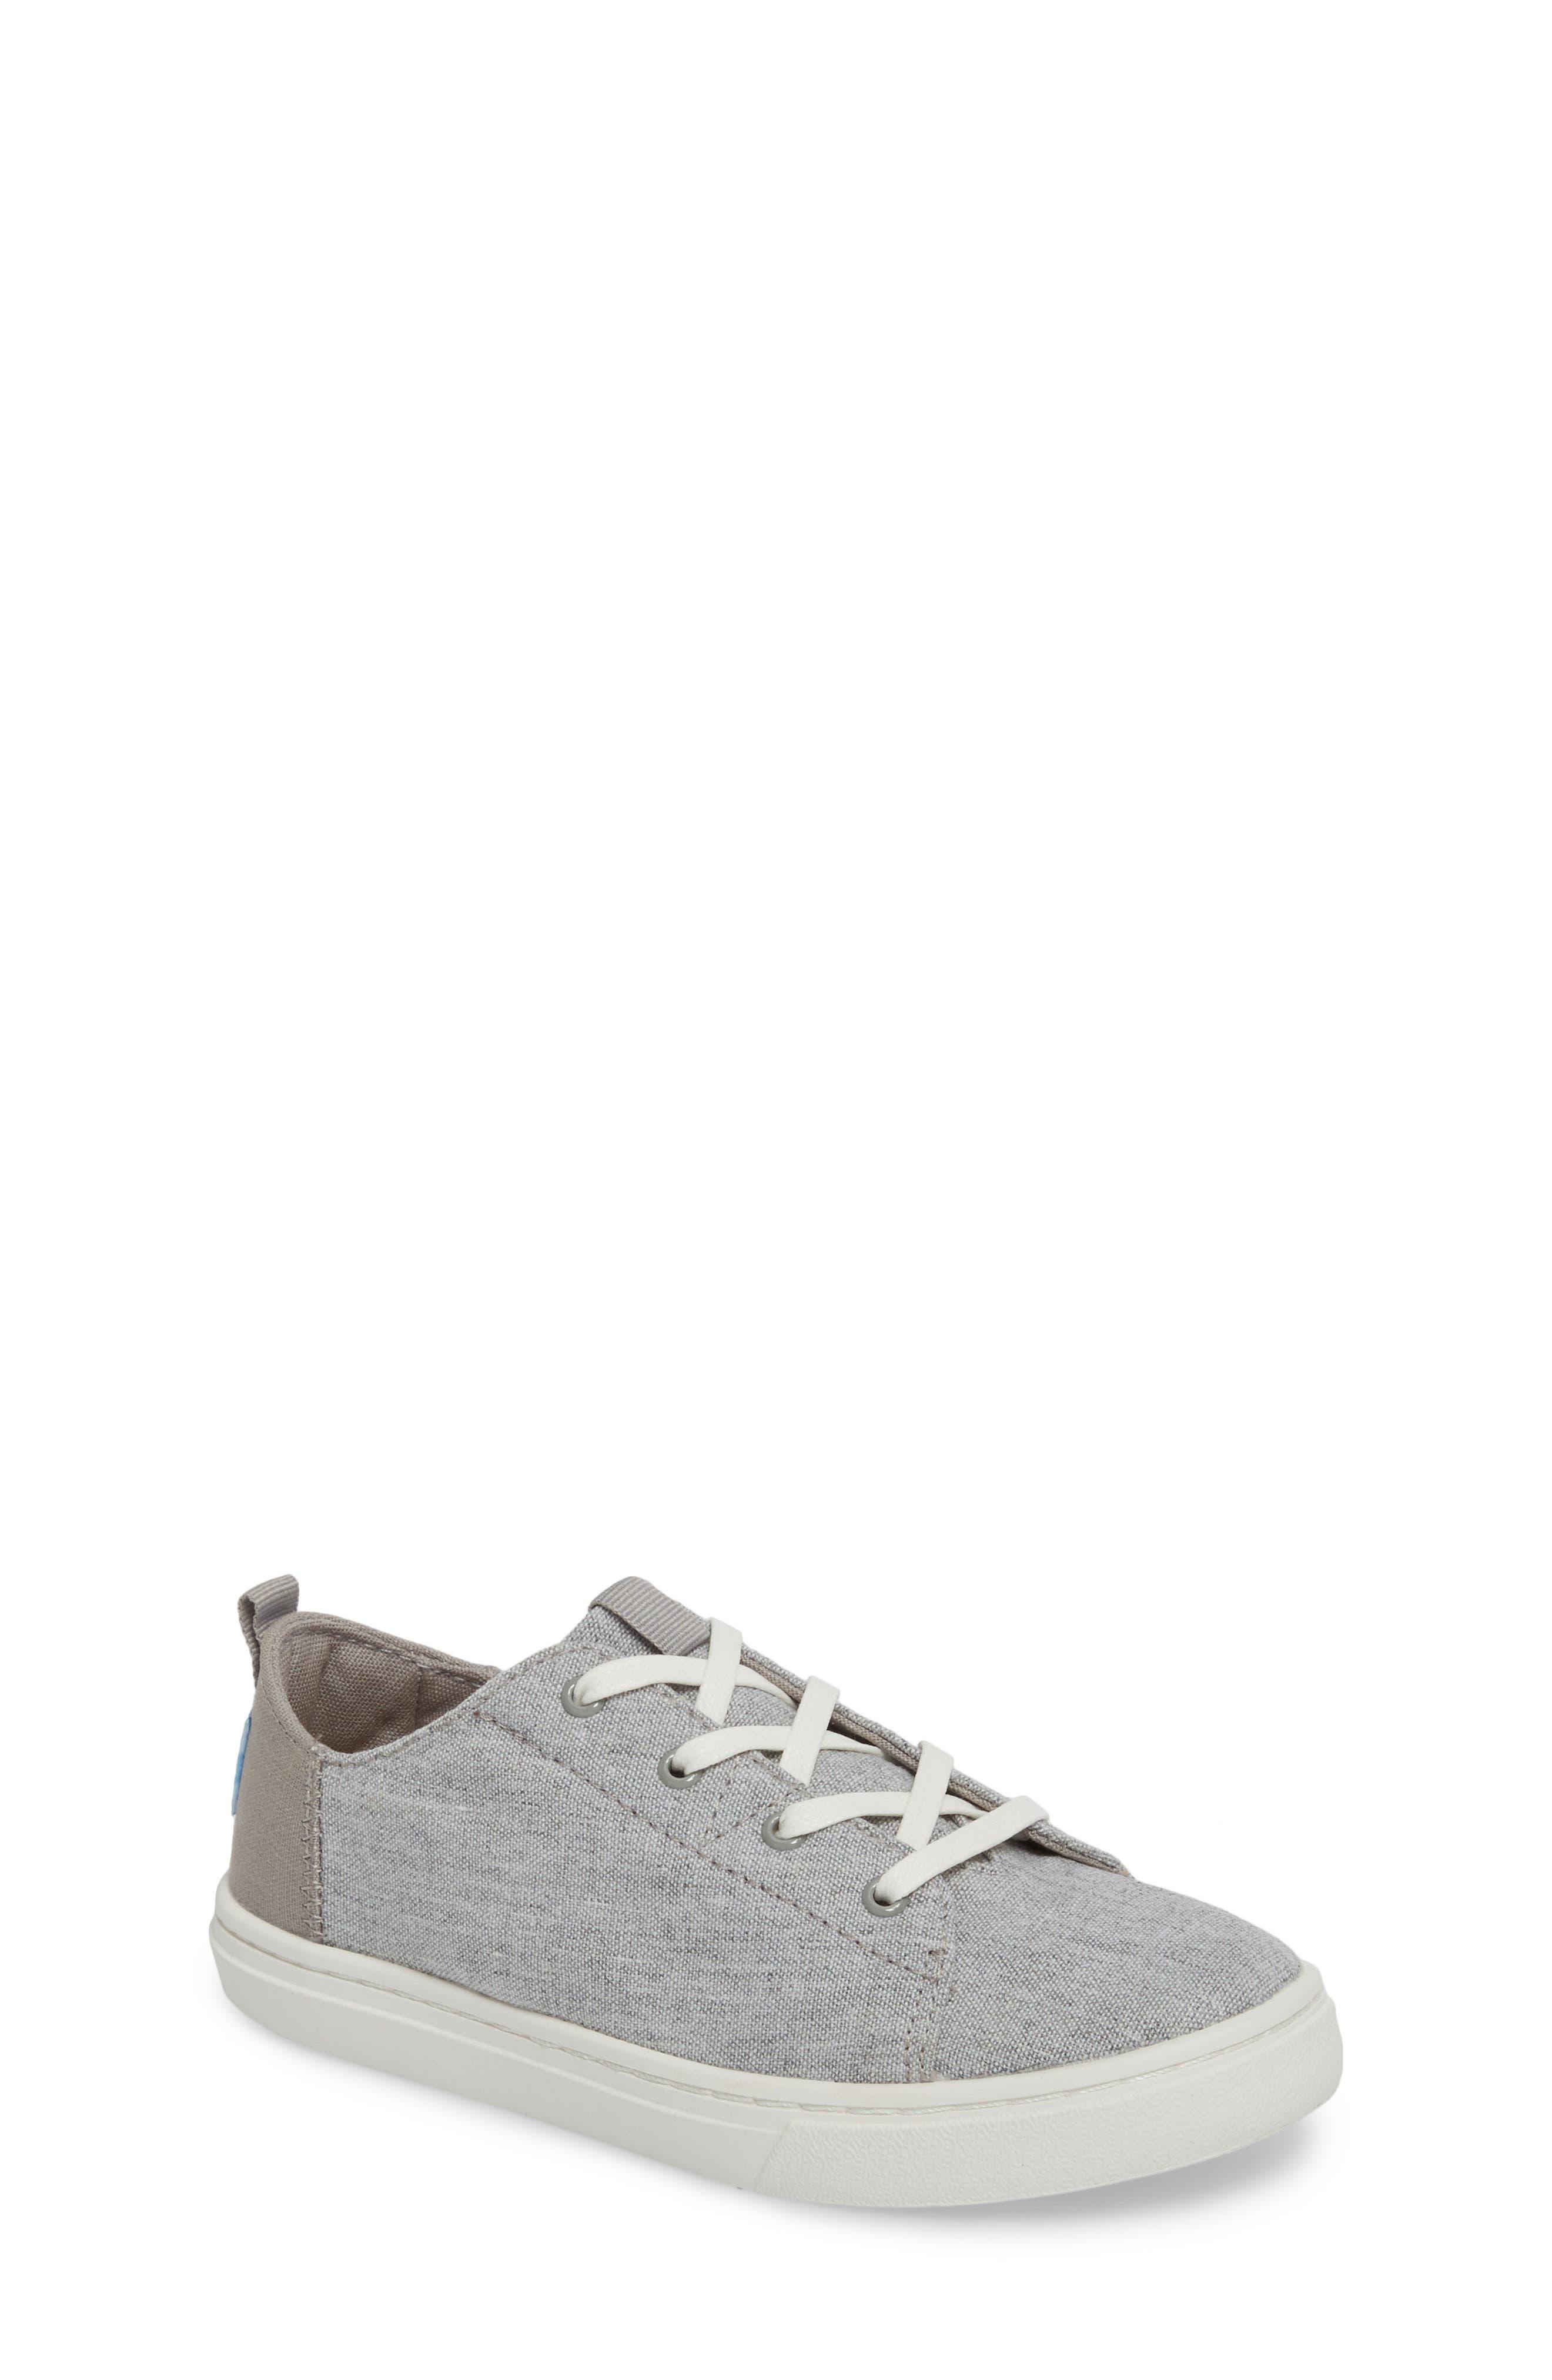 Lenny Sneaker,                         Main,                         color, Drizzle Grey Slub Chambray